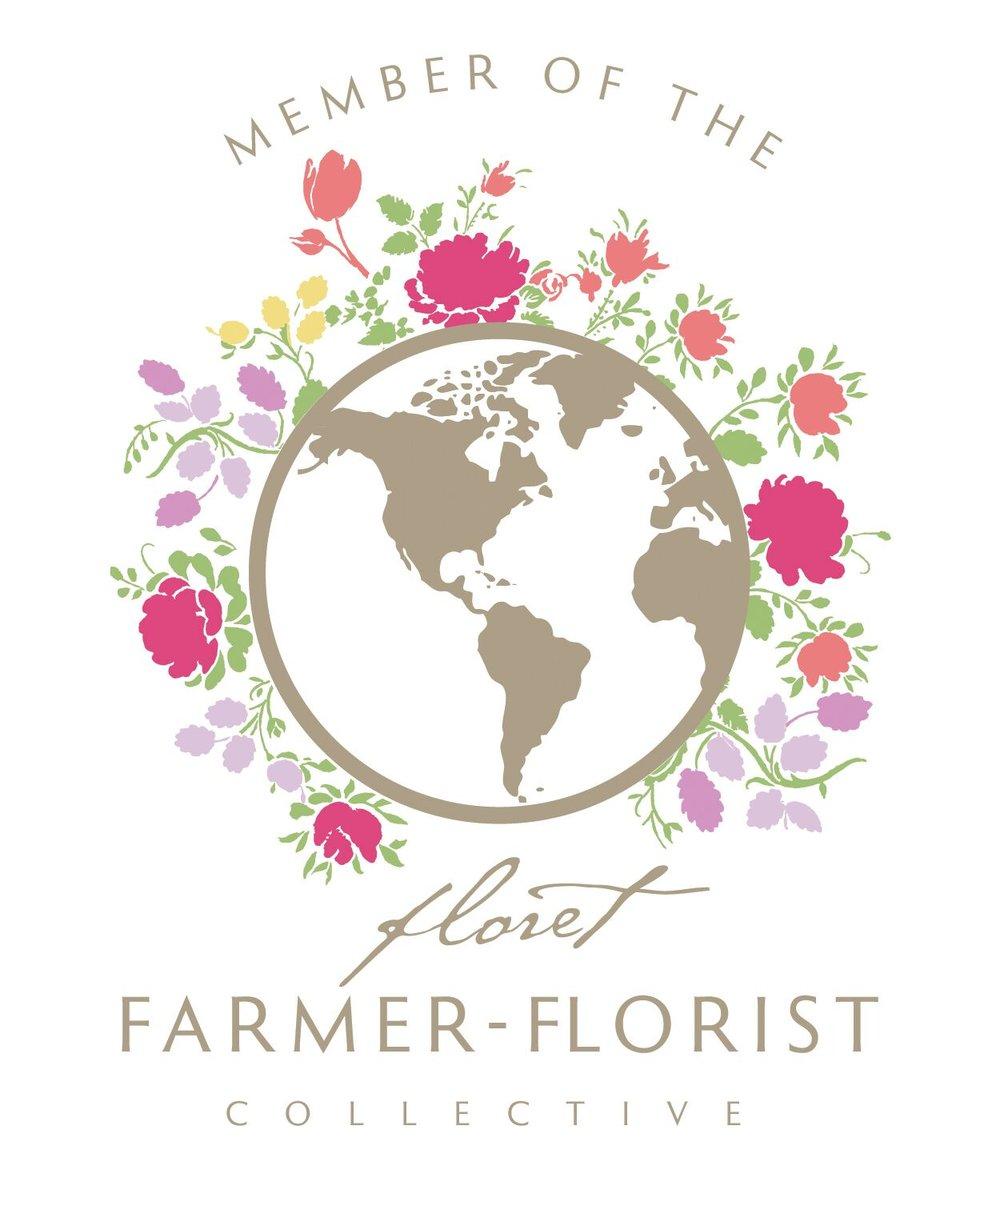 Farmer florist.jpeg